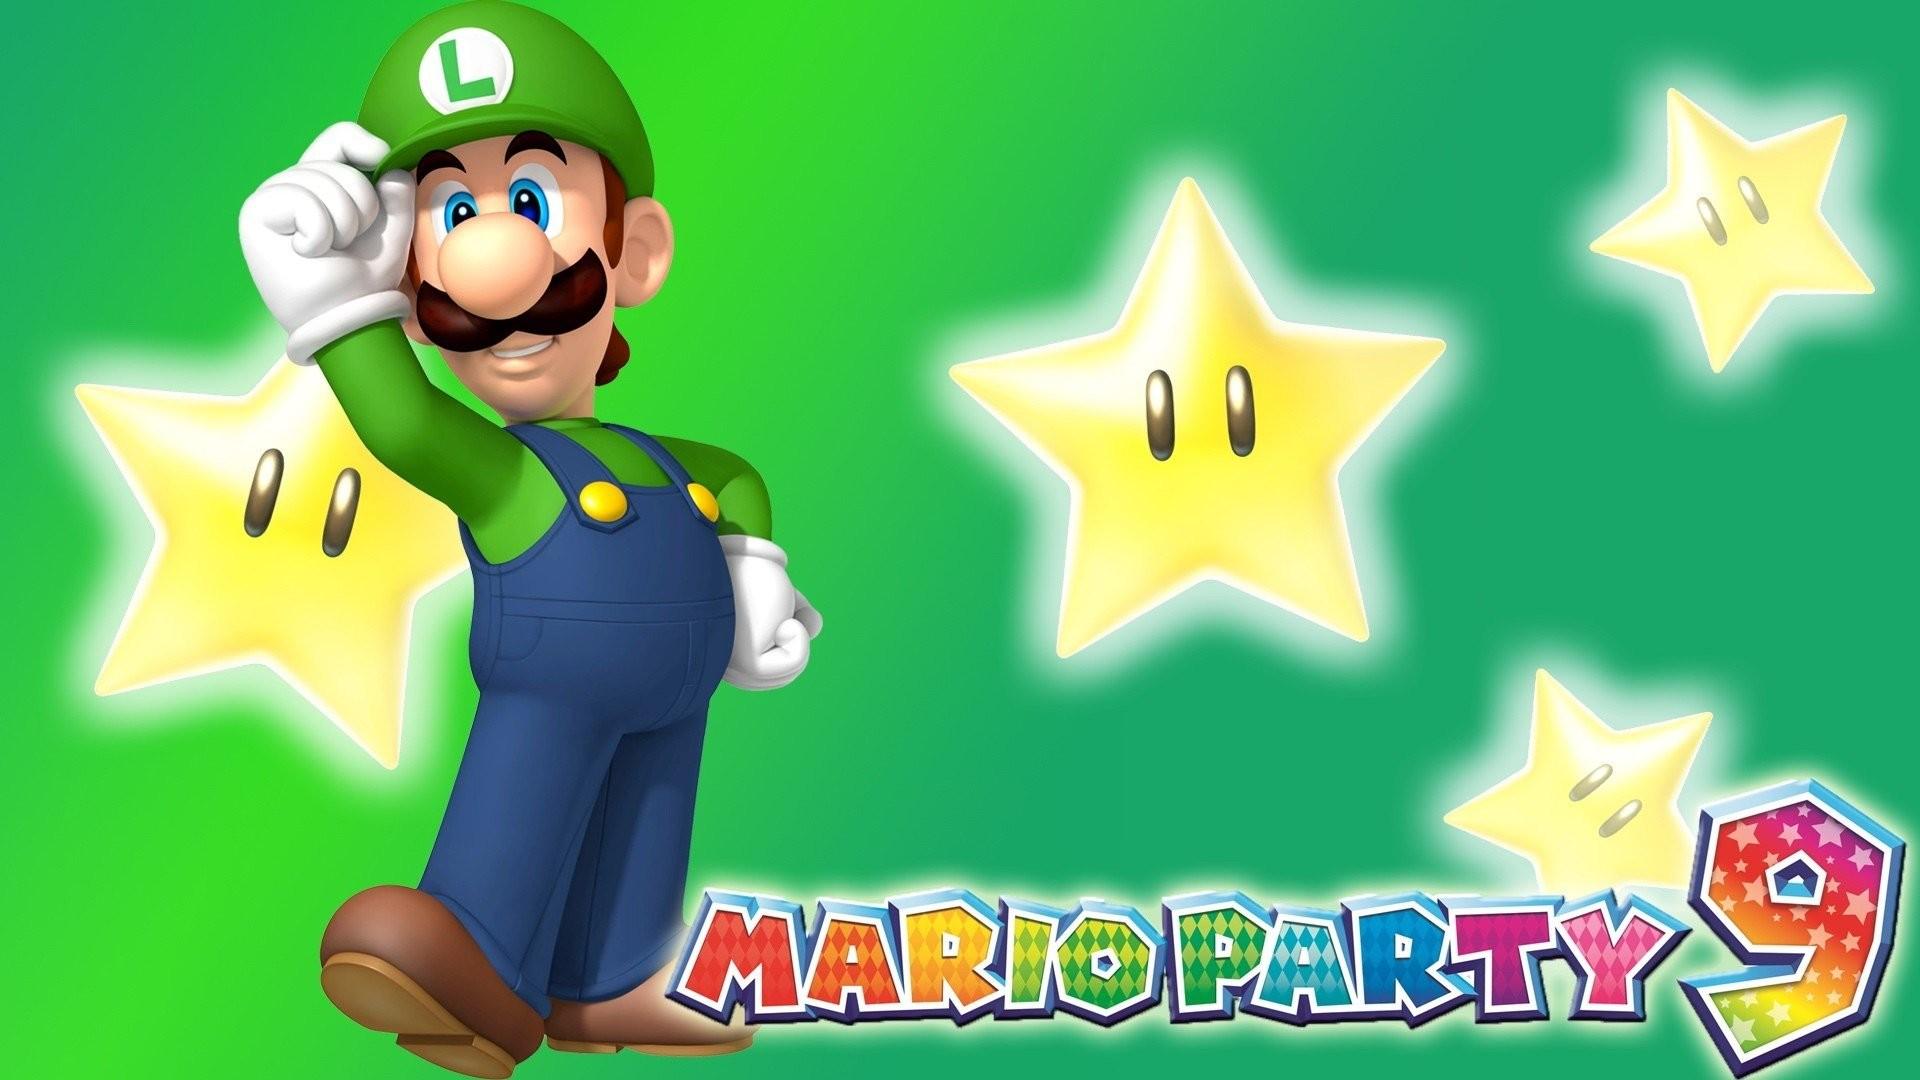 Mario Party Luigi Video Games Nintendo 9 Stars Green Background